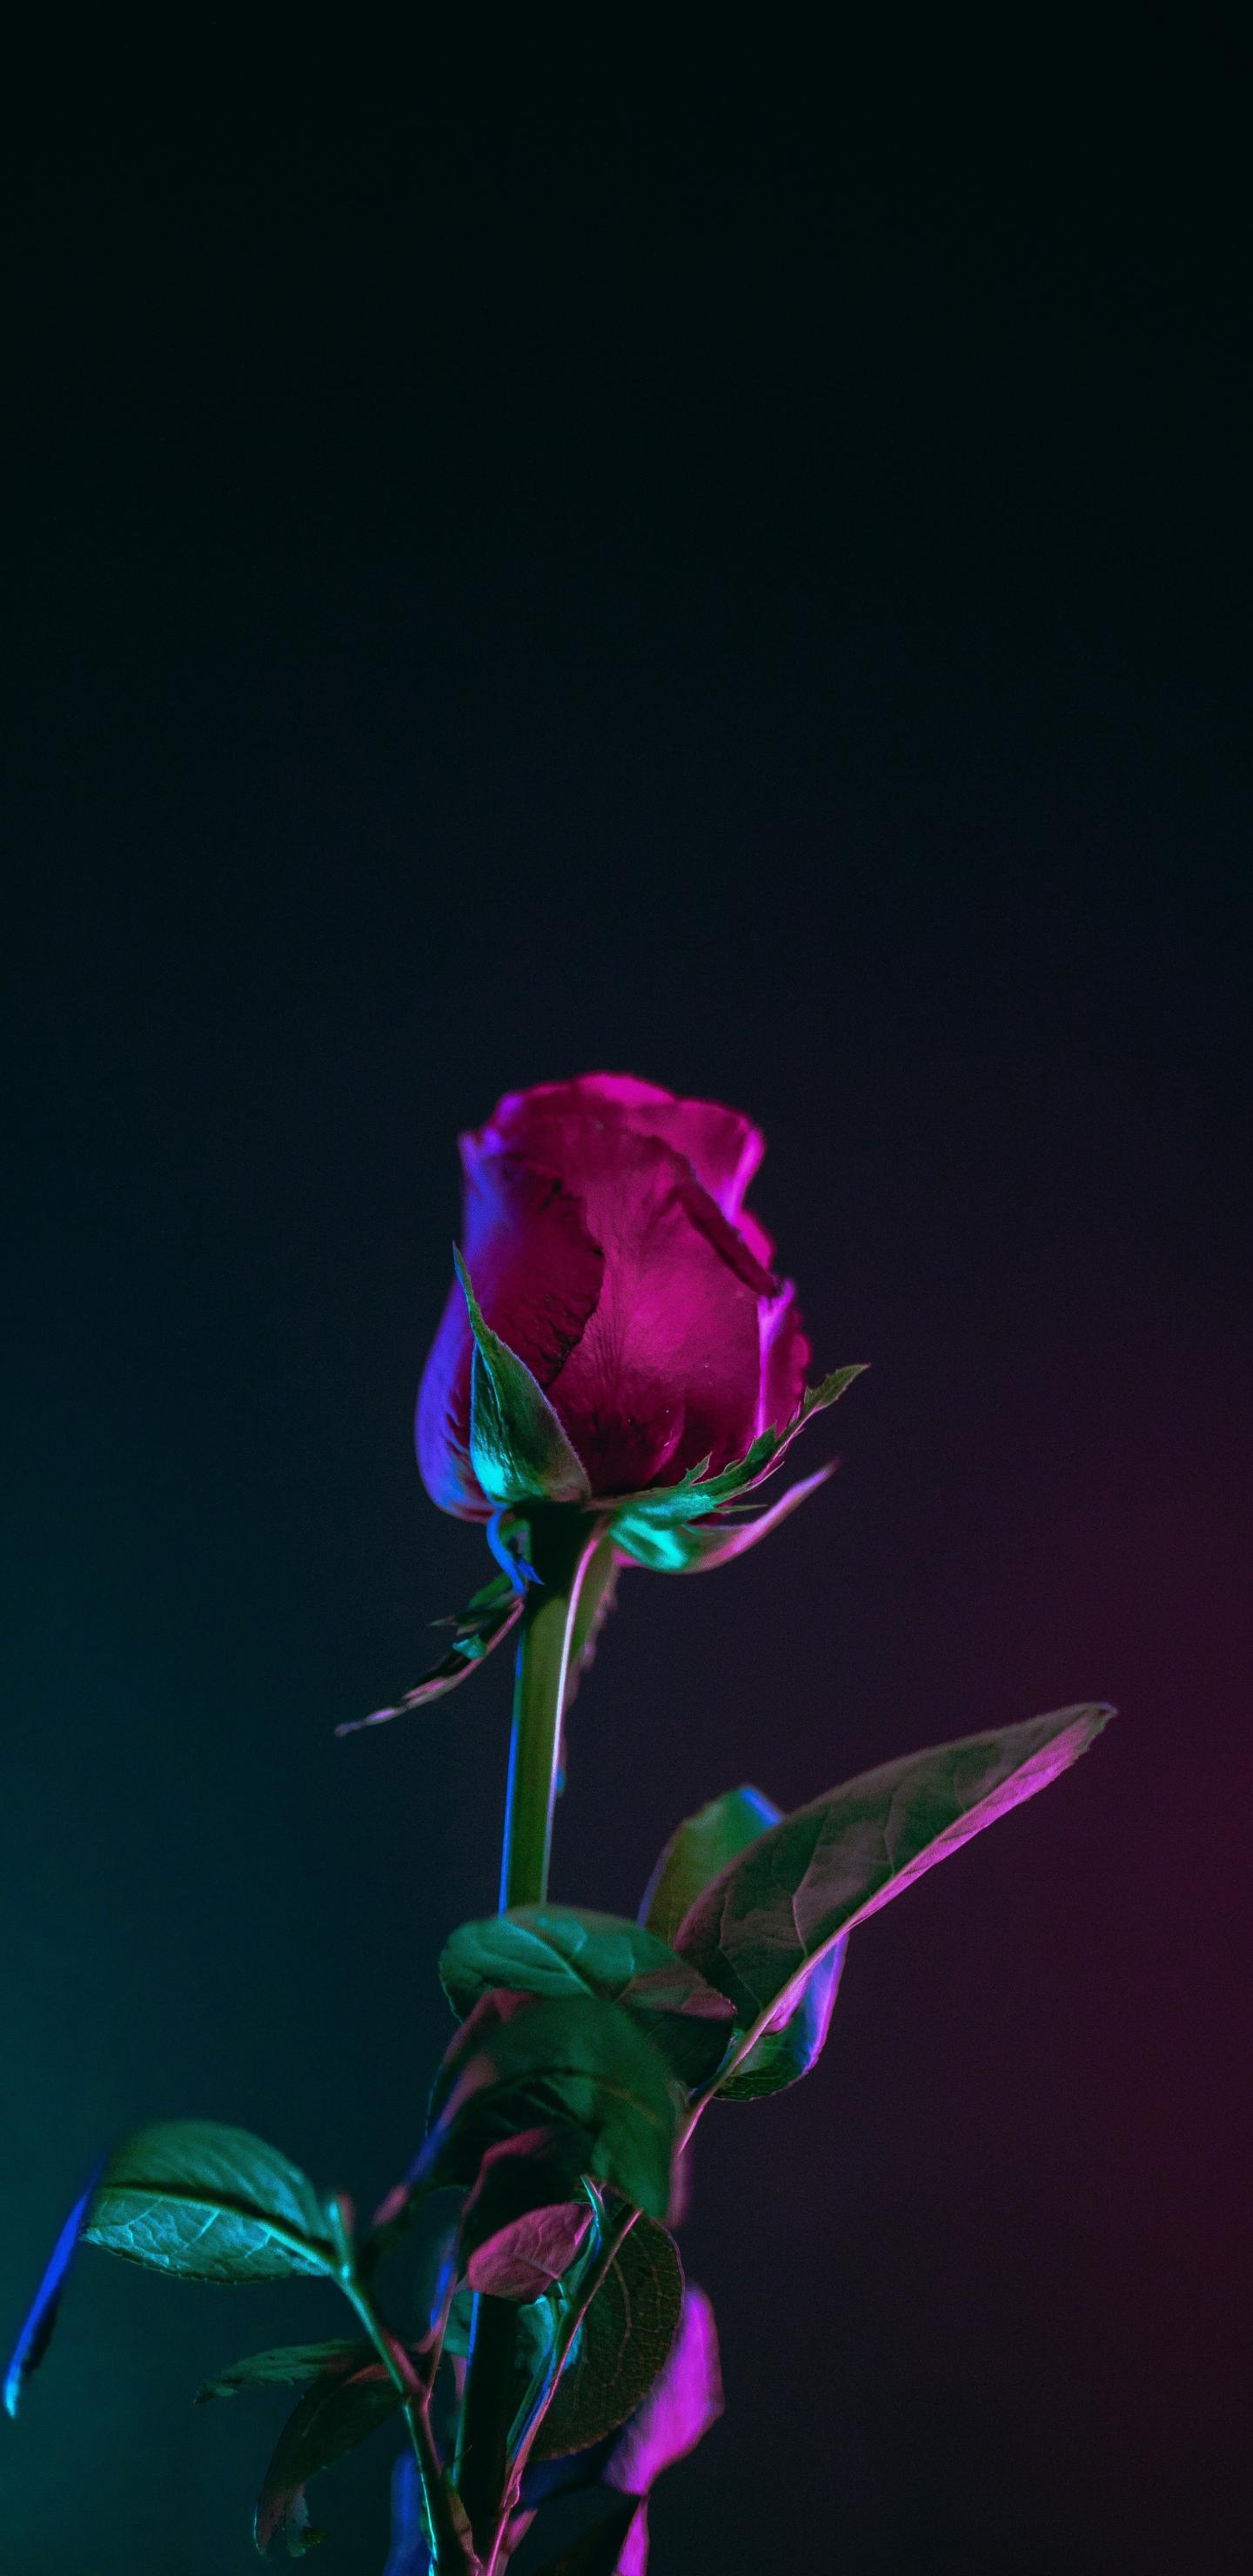 Download 1440x2960 Wallpaper Rose Bud Stem Portrait Samsung Galaxy S8 Samsung Galaxy S8 Plus 1440x2960 Hd Image Background 8825